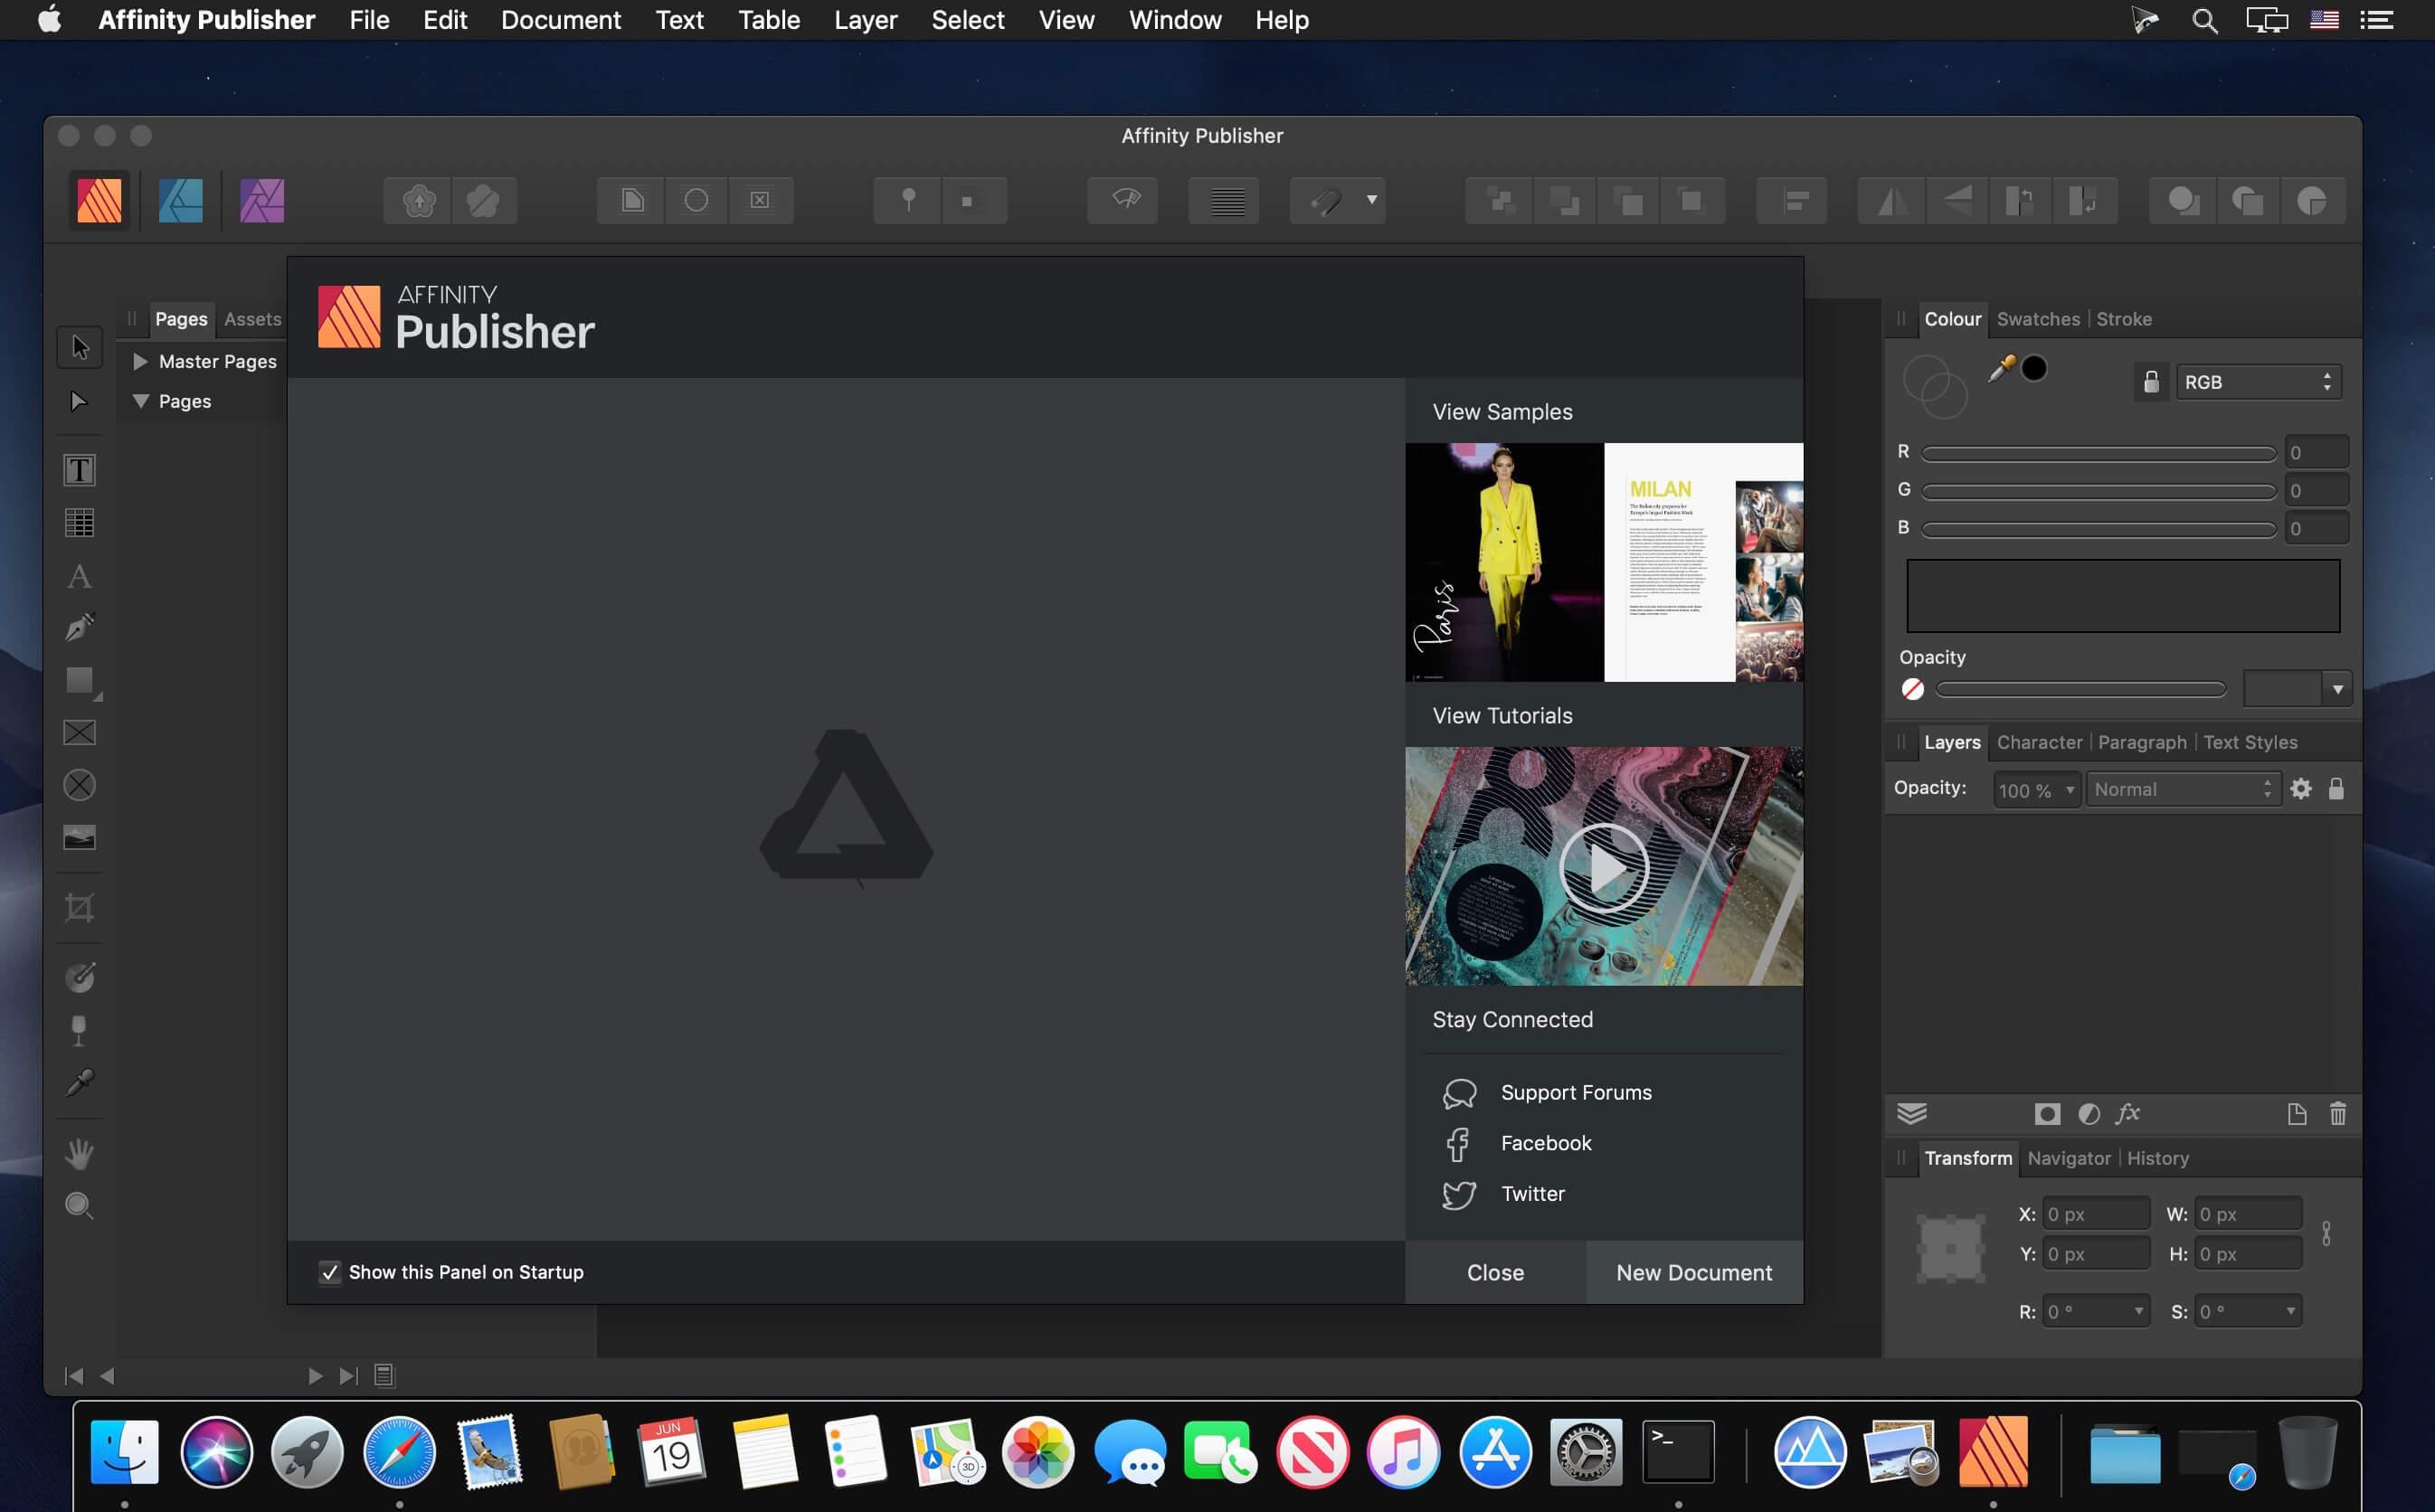 「macOS」Affinity Publisher 破解版下载 图形设计 V1.8.2插图(1)